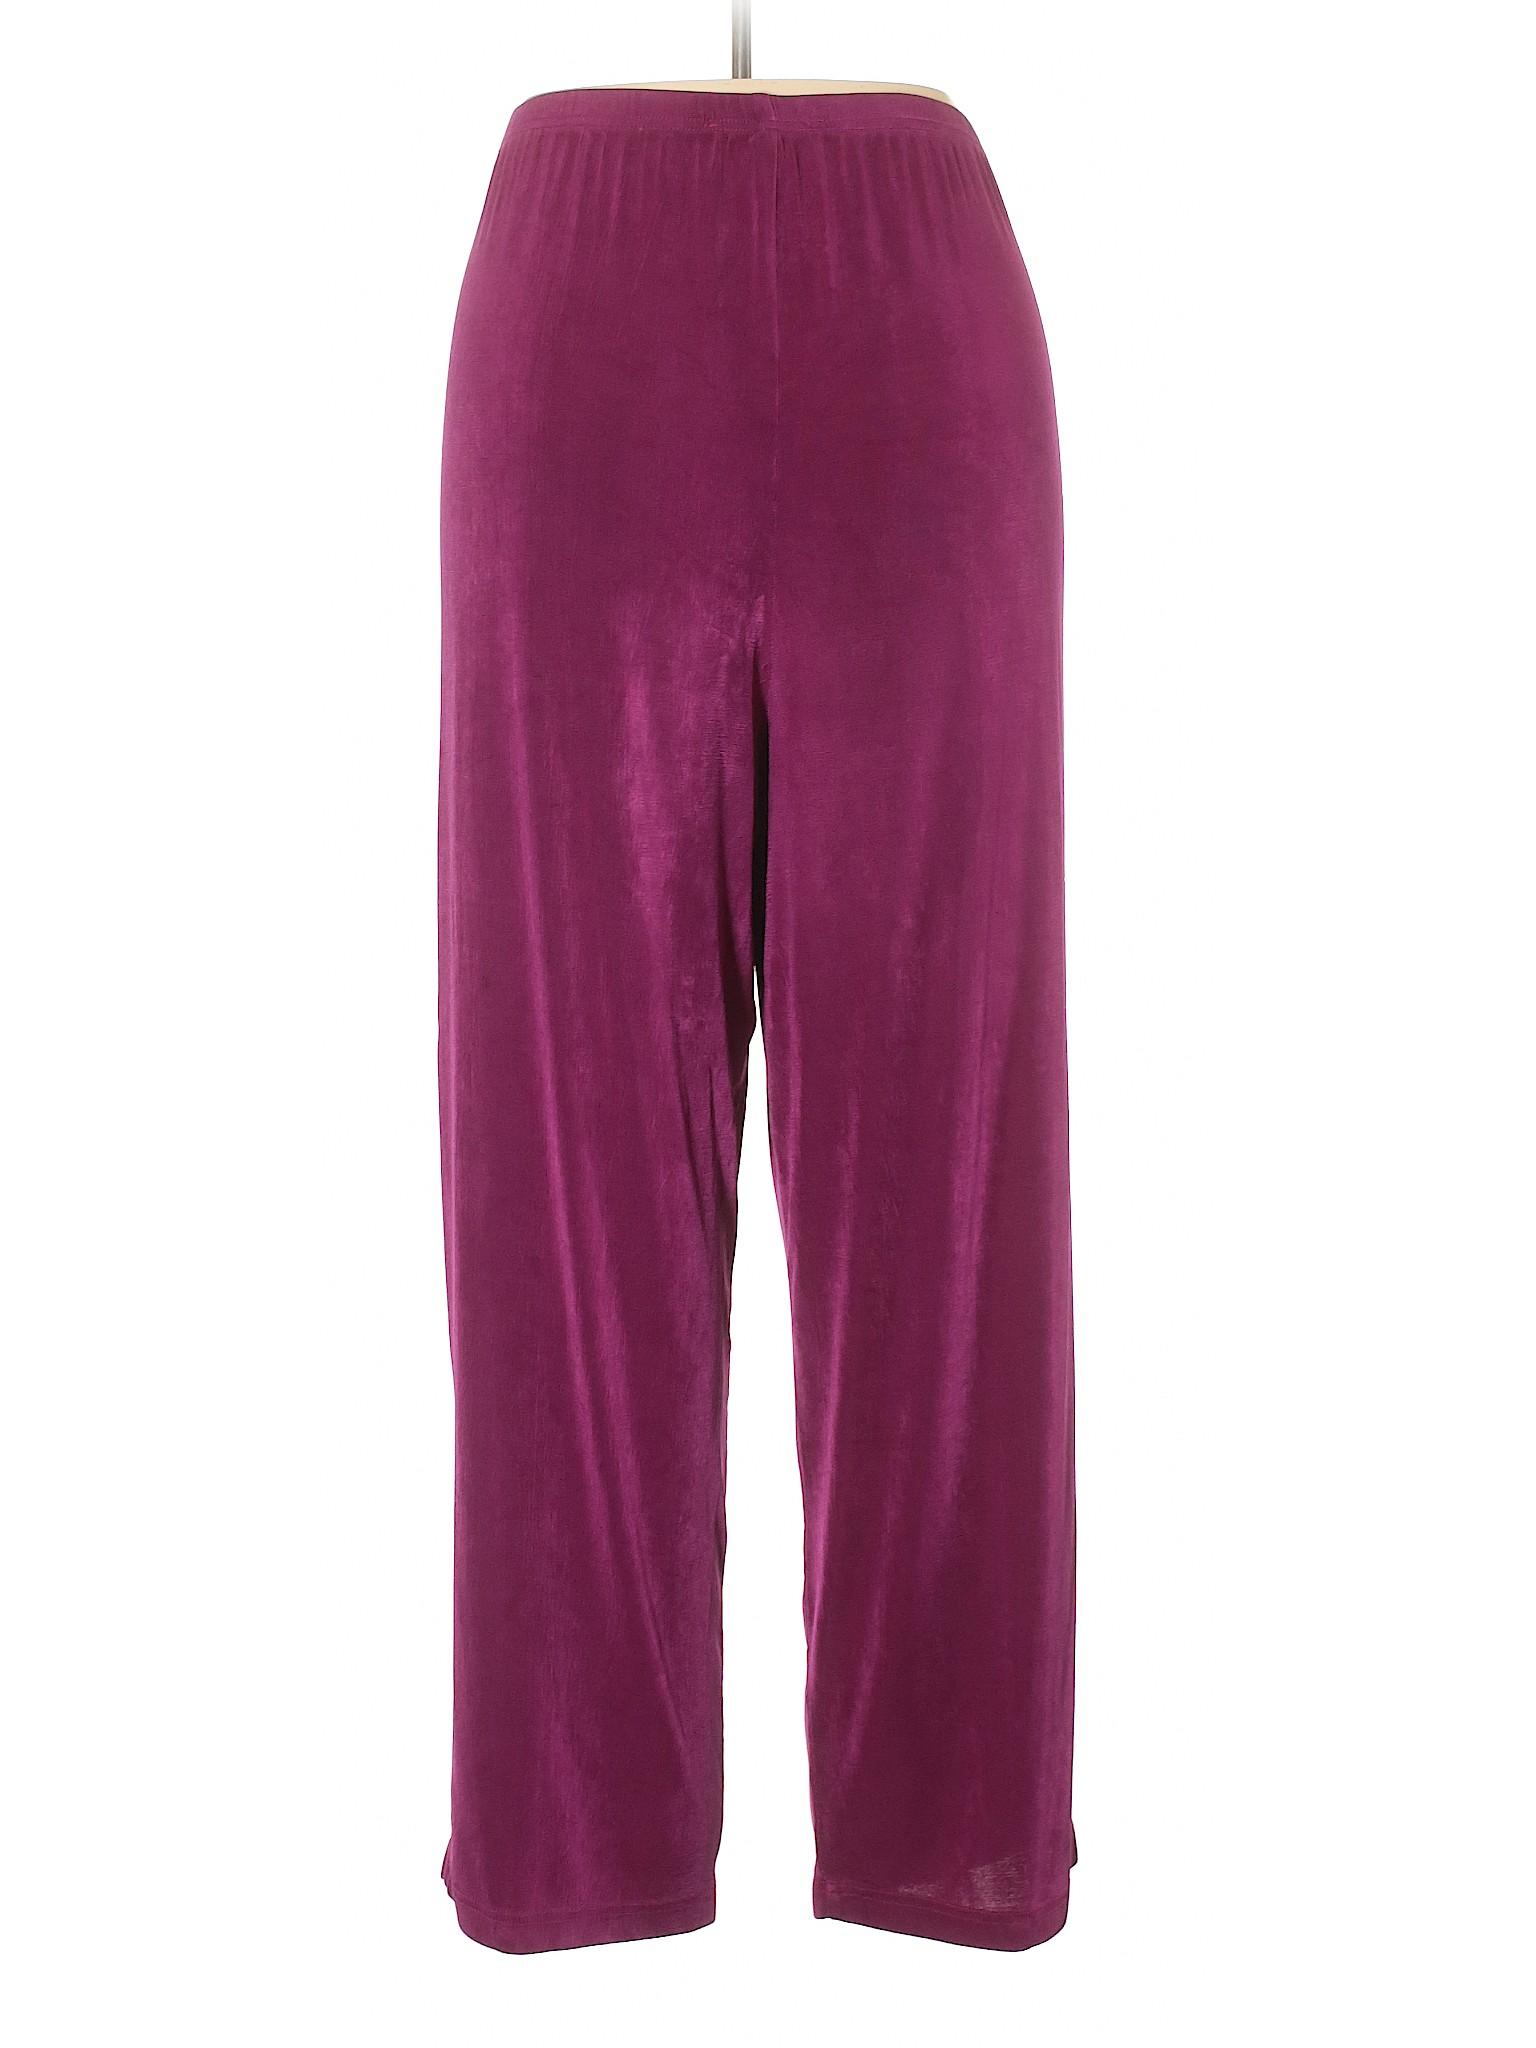 II Nicole Boutique Ronni winter Casual Pants qzwEtw